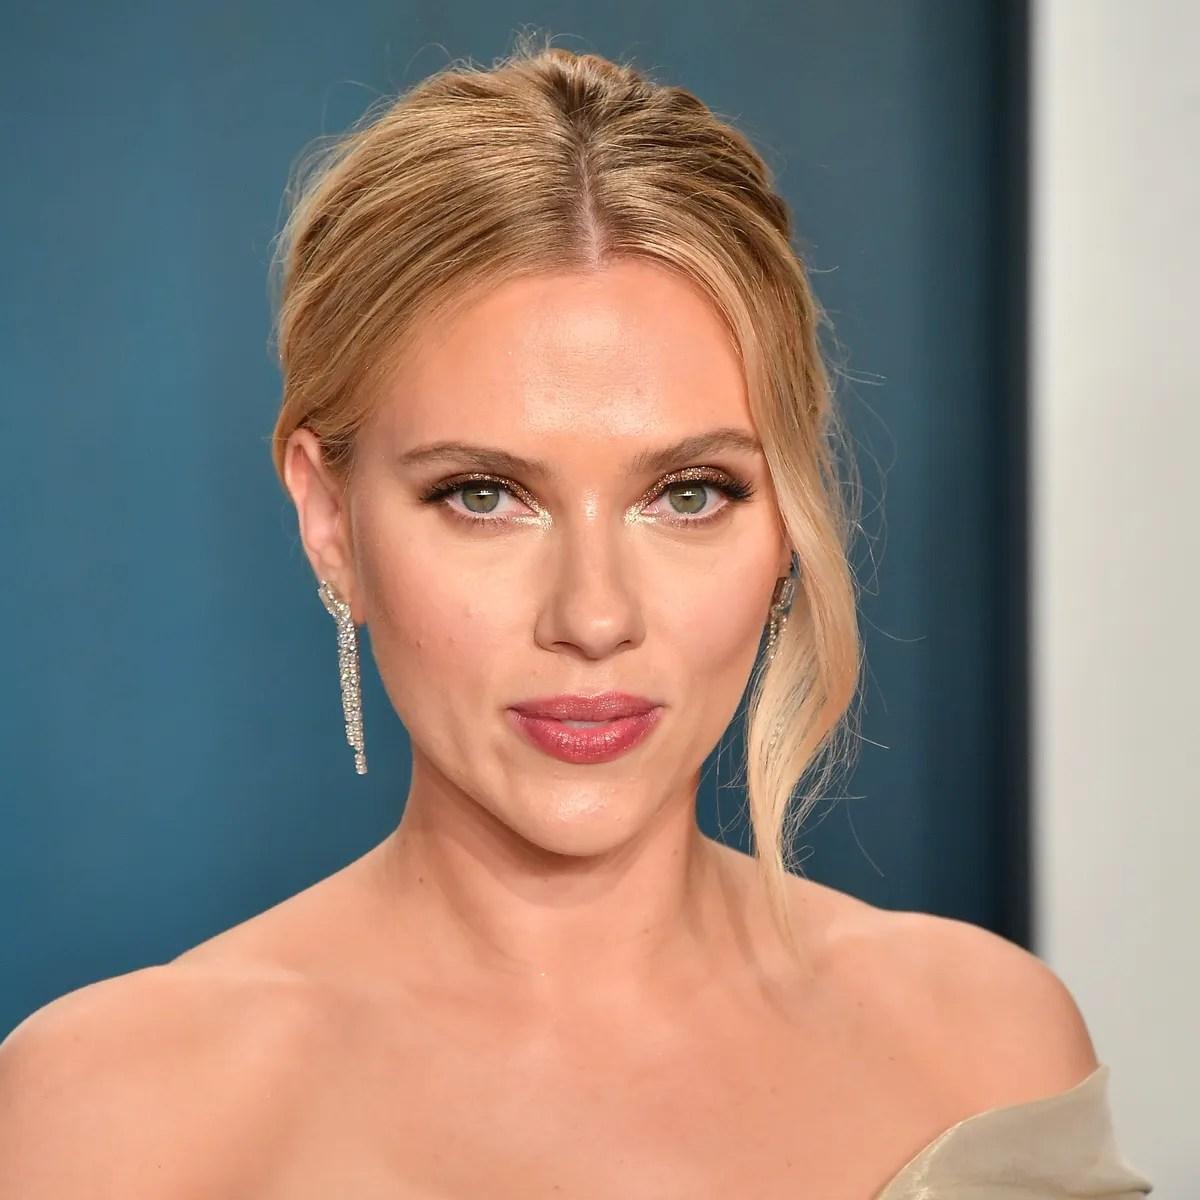 Decorative Image of Scarlett Johansson